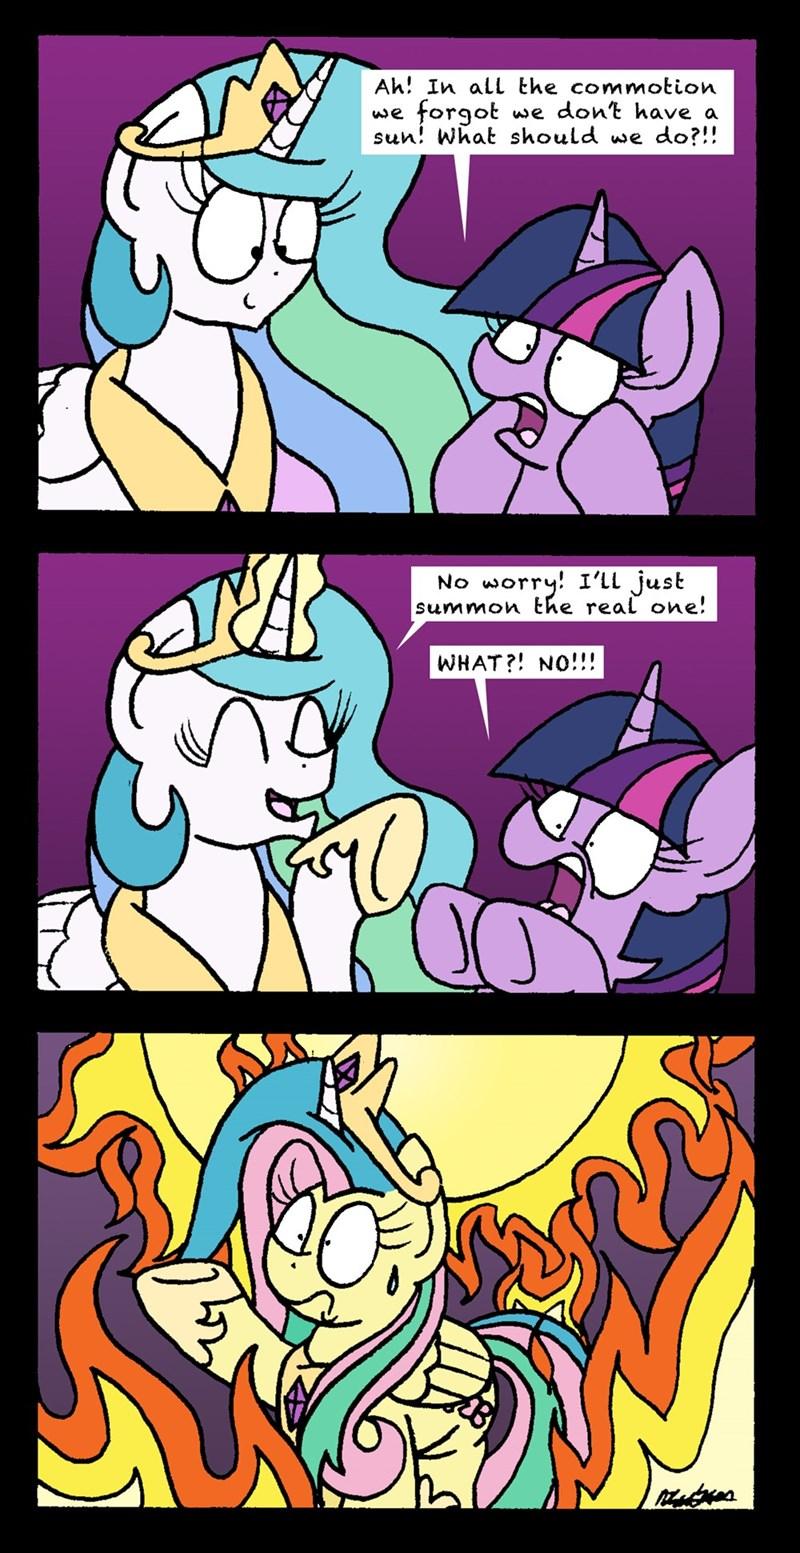 horse play bob the dalek twilight sparkle comic princess celestia fluttershy - 9157010944